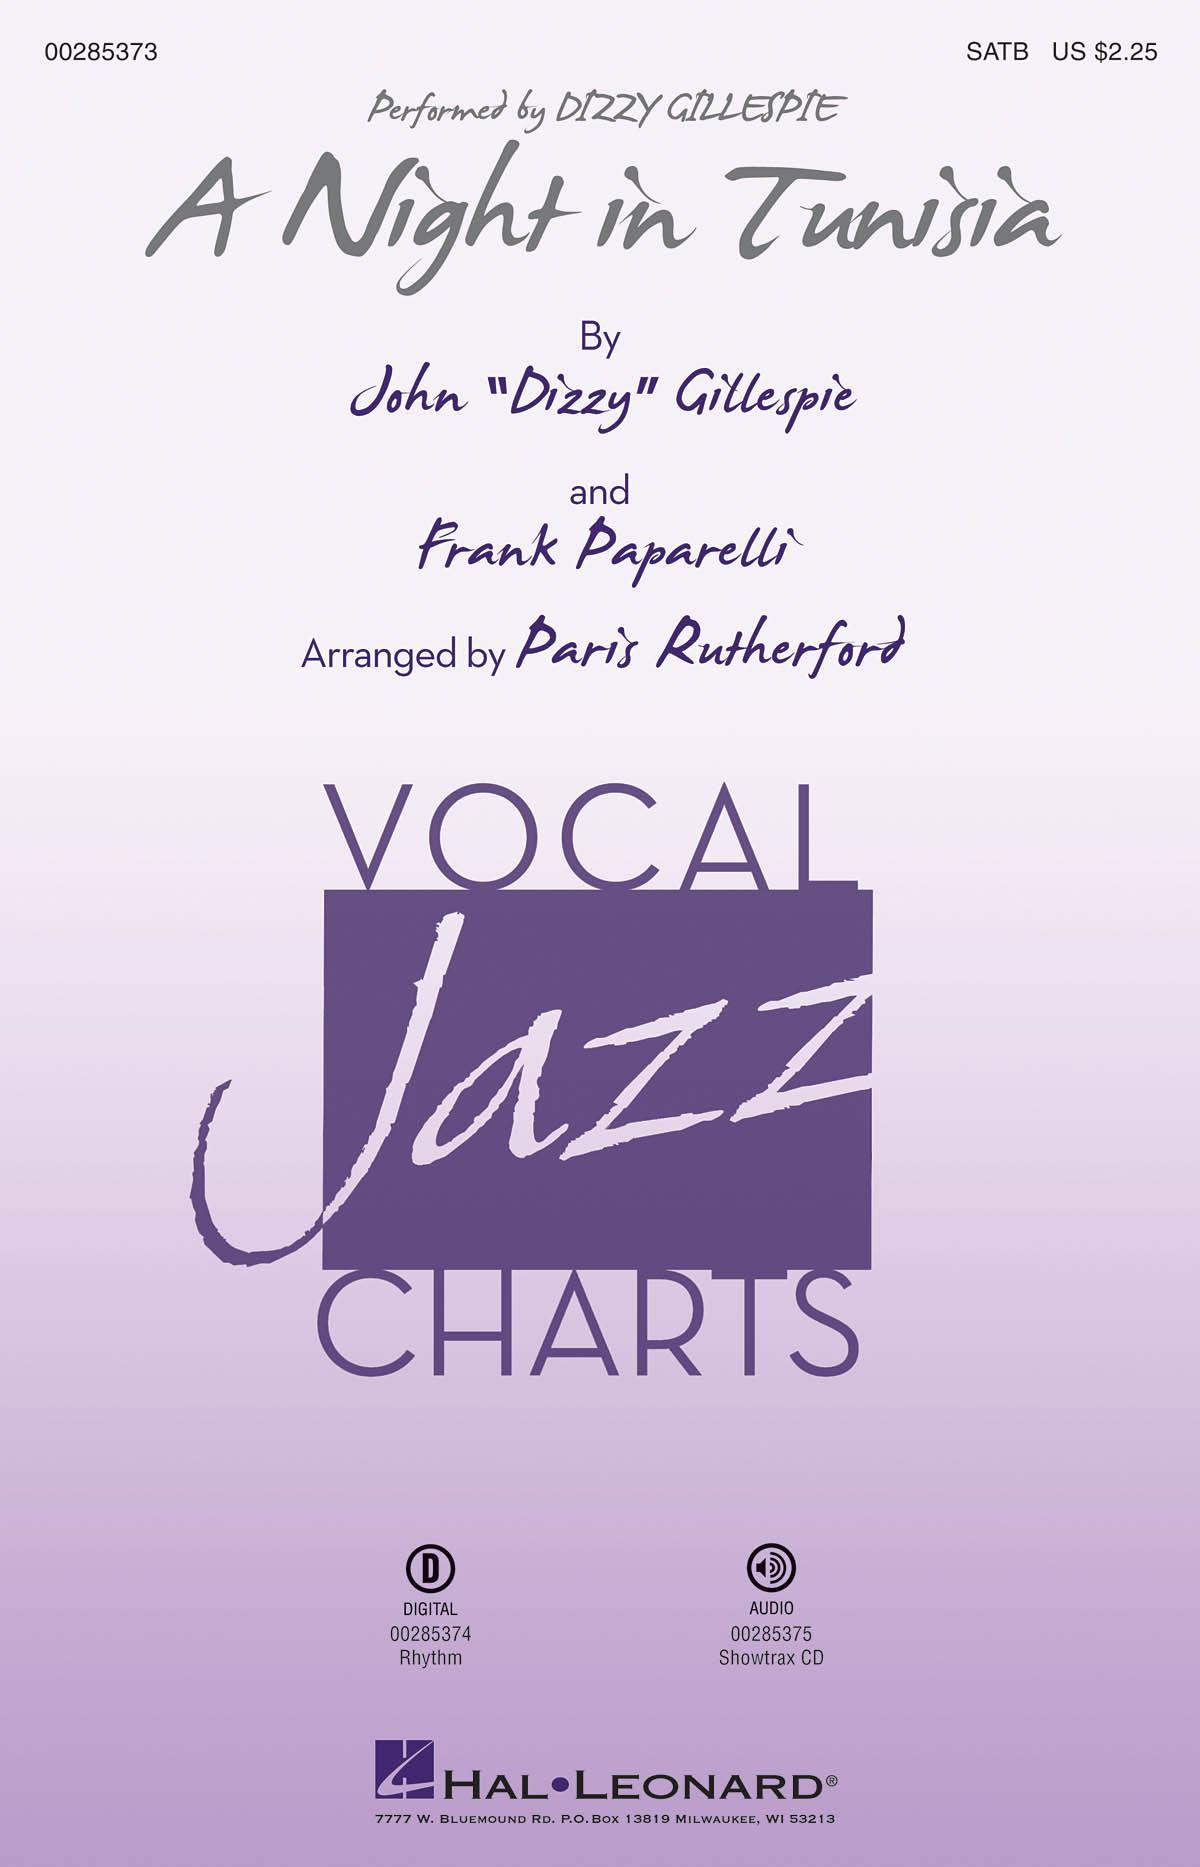 Dizzy Gillespie Frank Paparelli: A Night in Tunisia: Mixed Choir a Cappella: